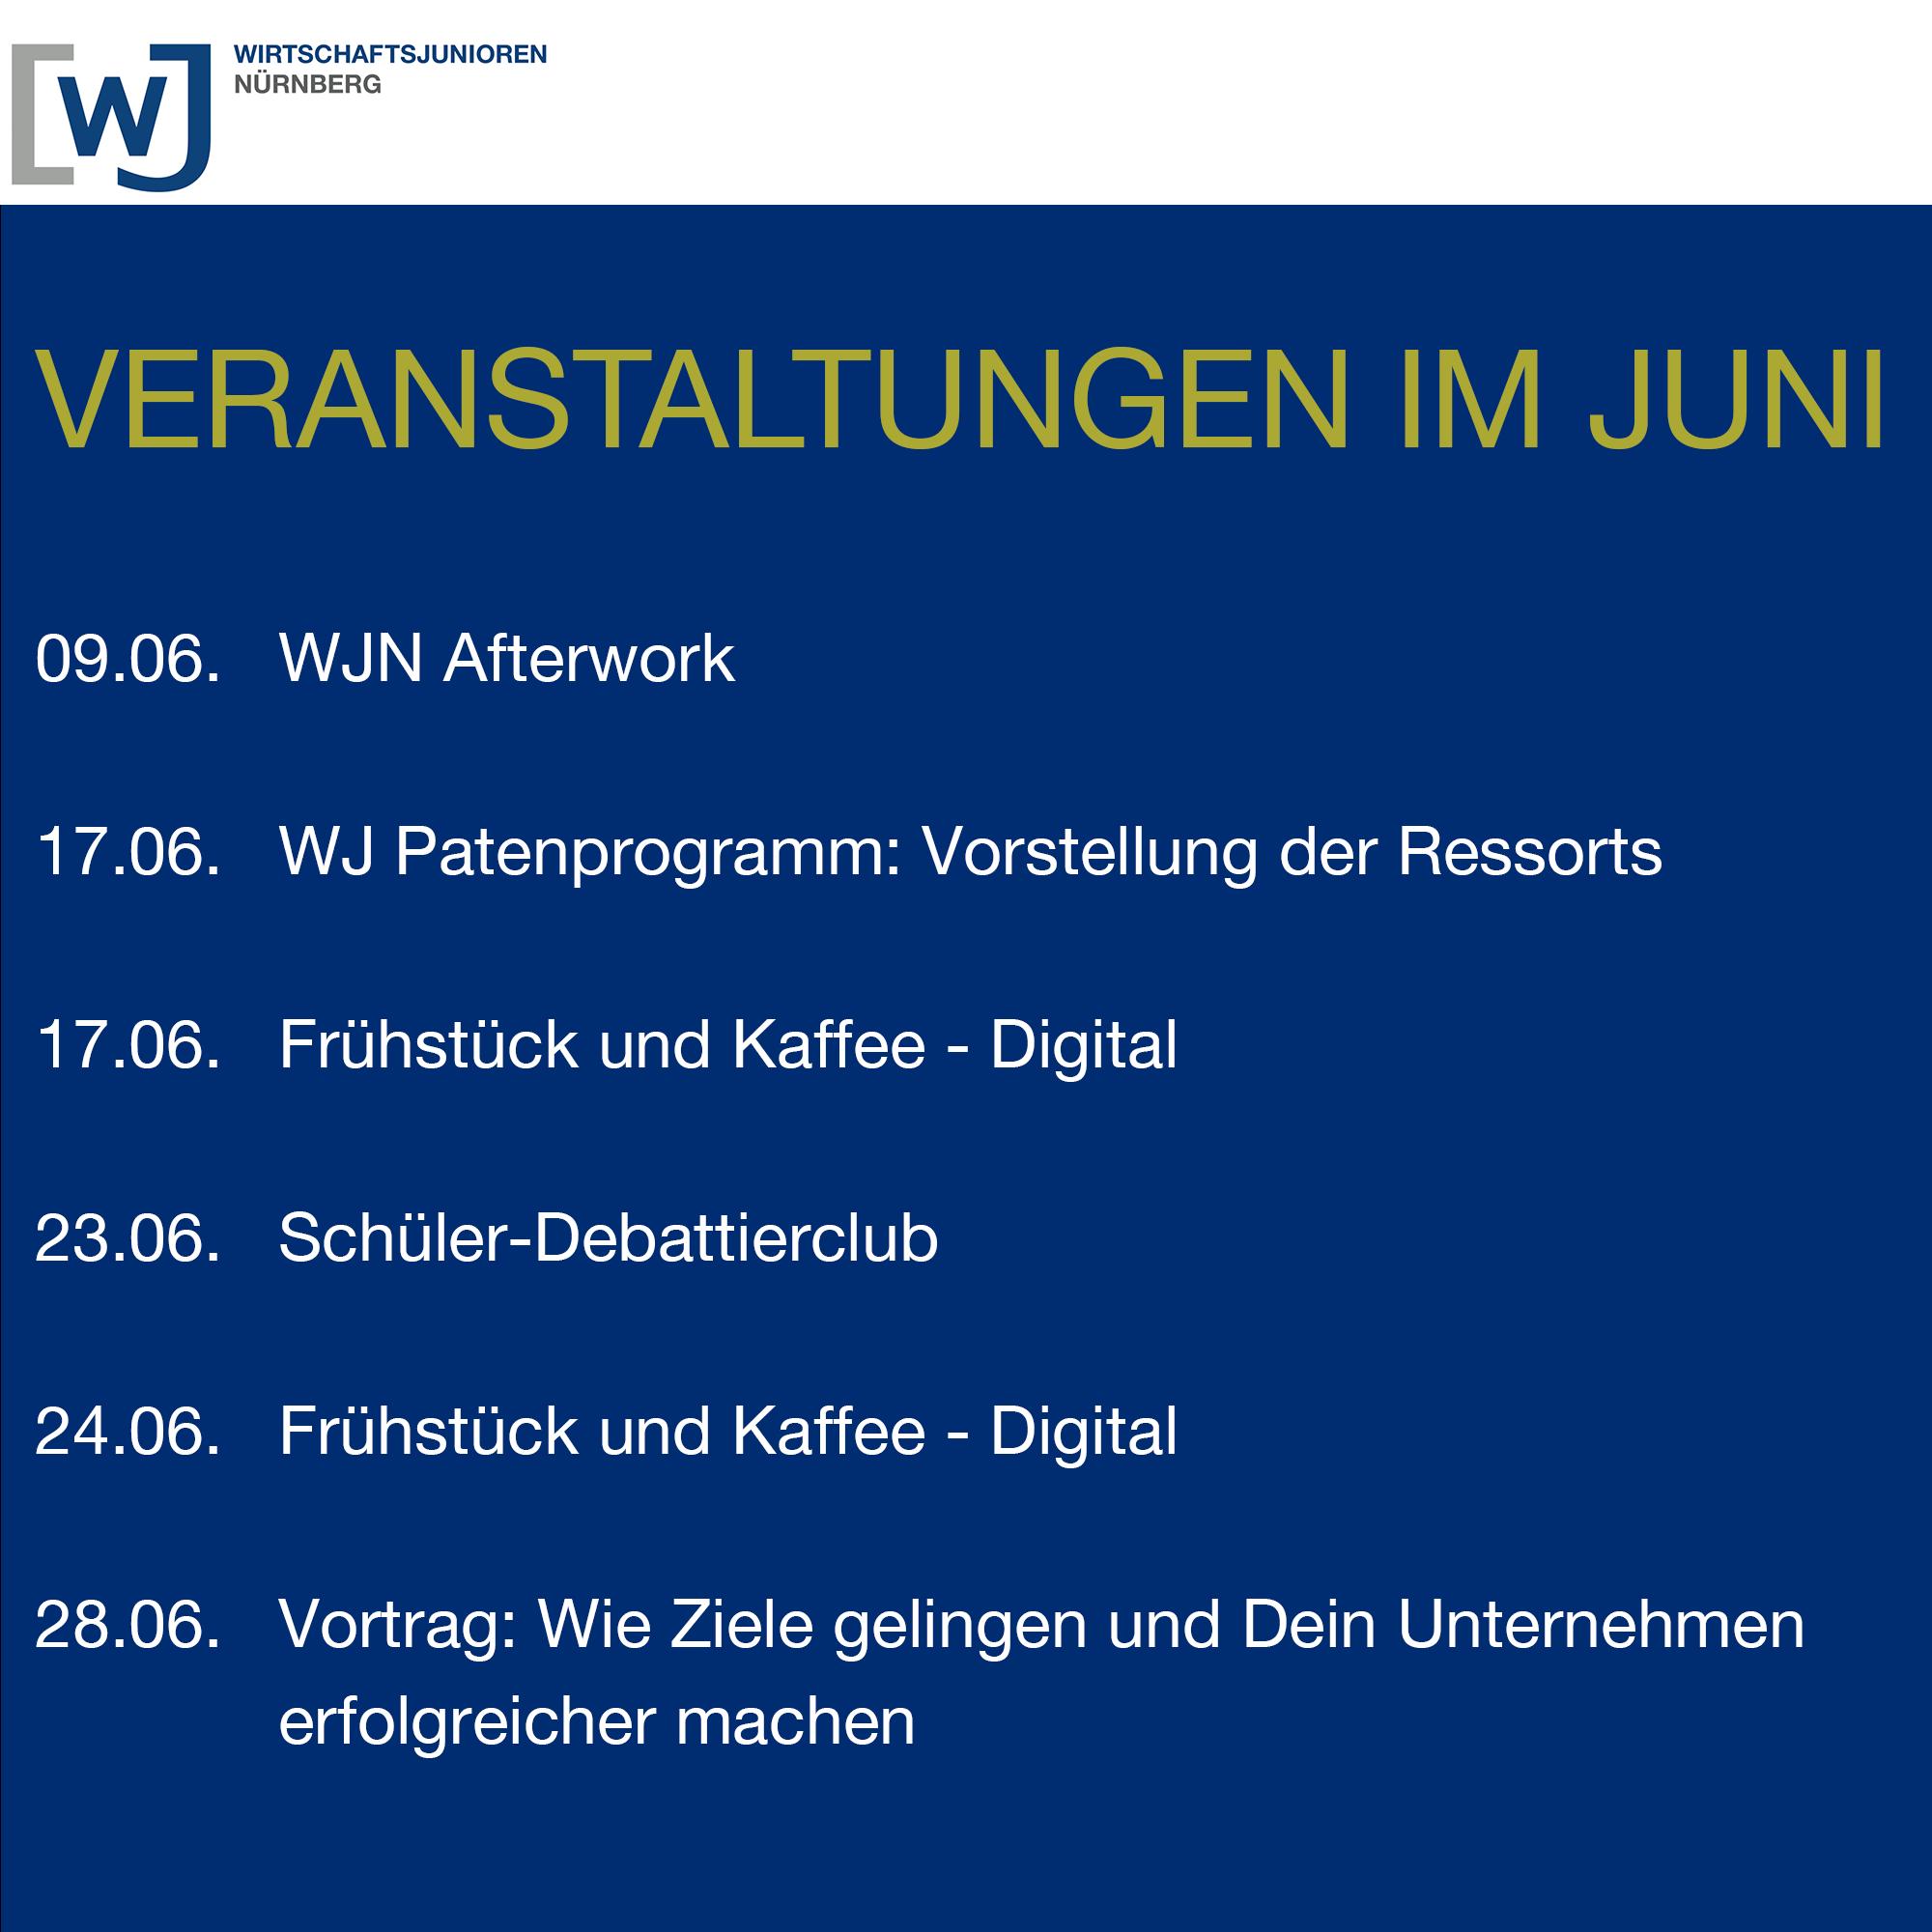 Programm im Juni